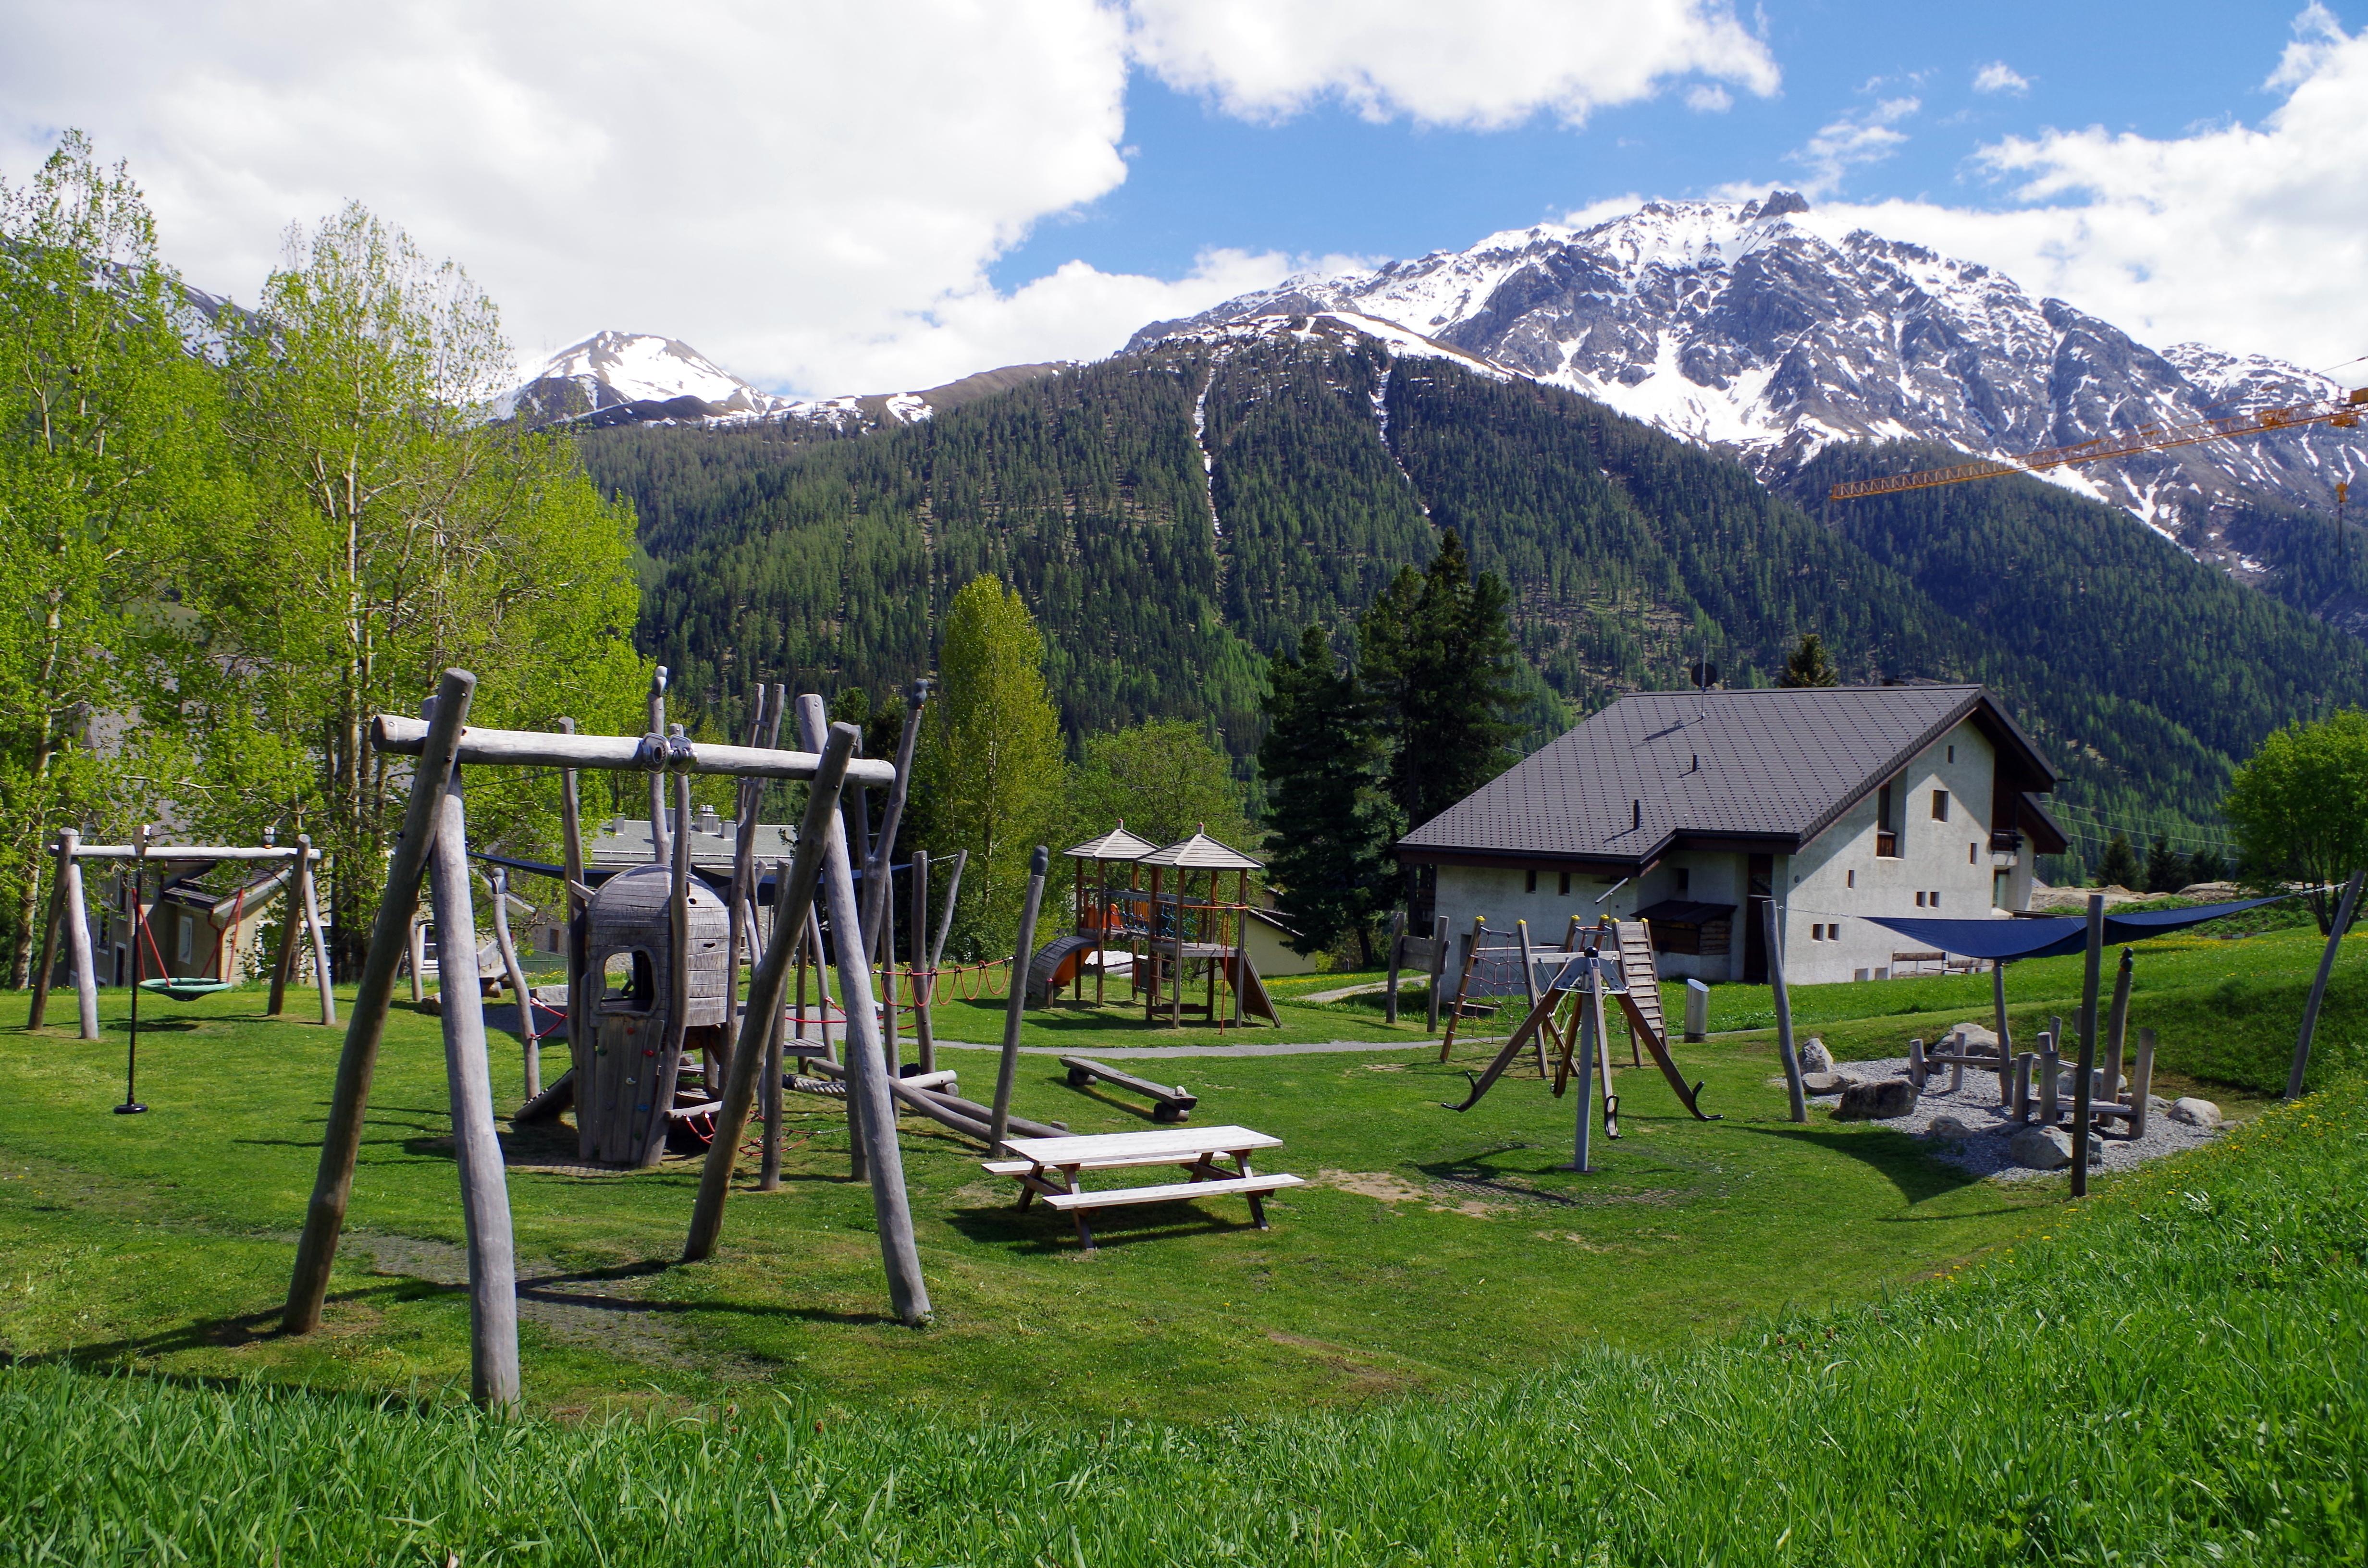 Kinderspielplatz Eulalia Slide 2